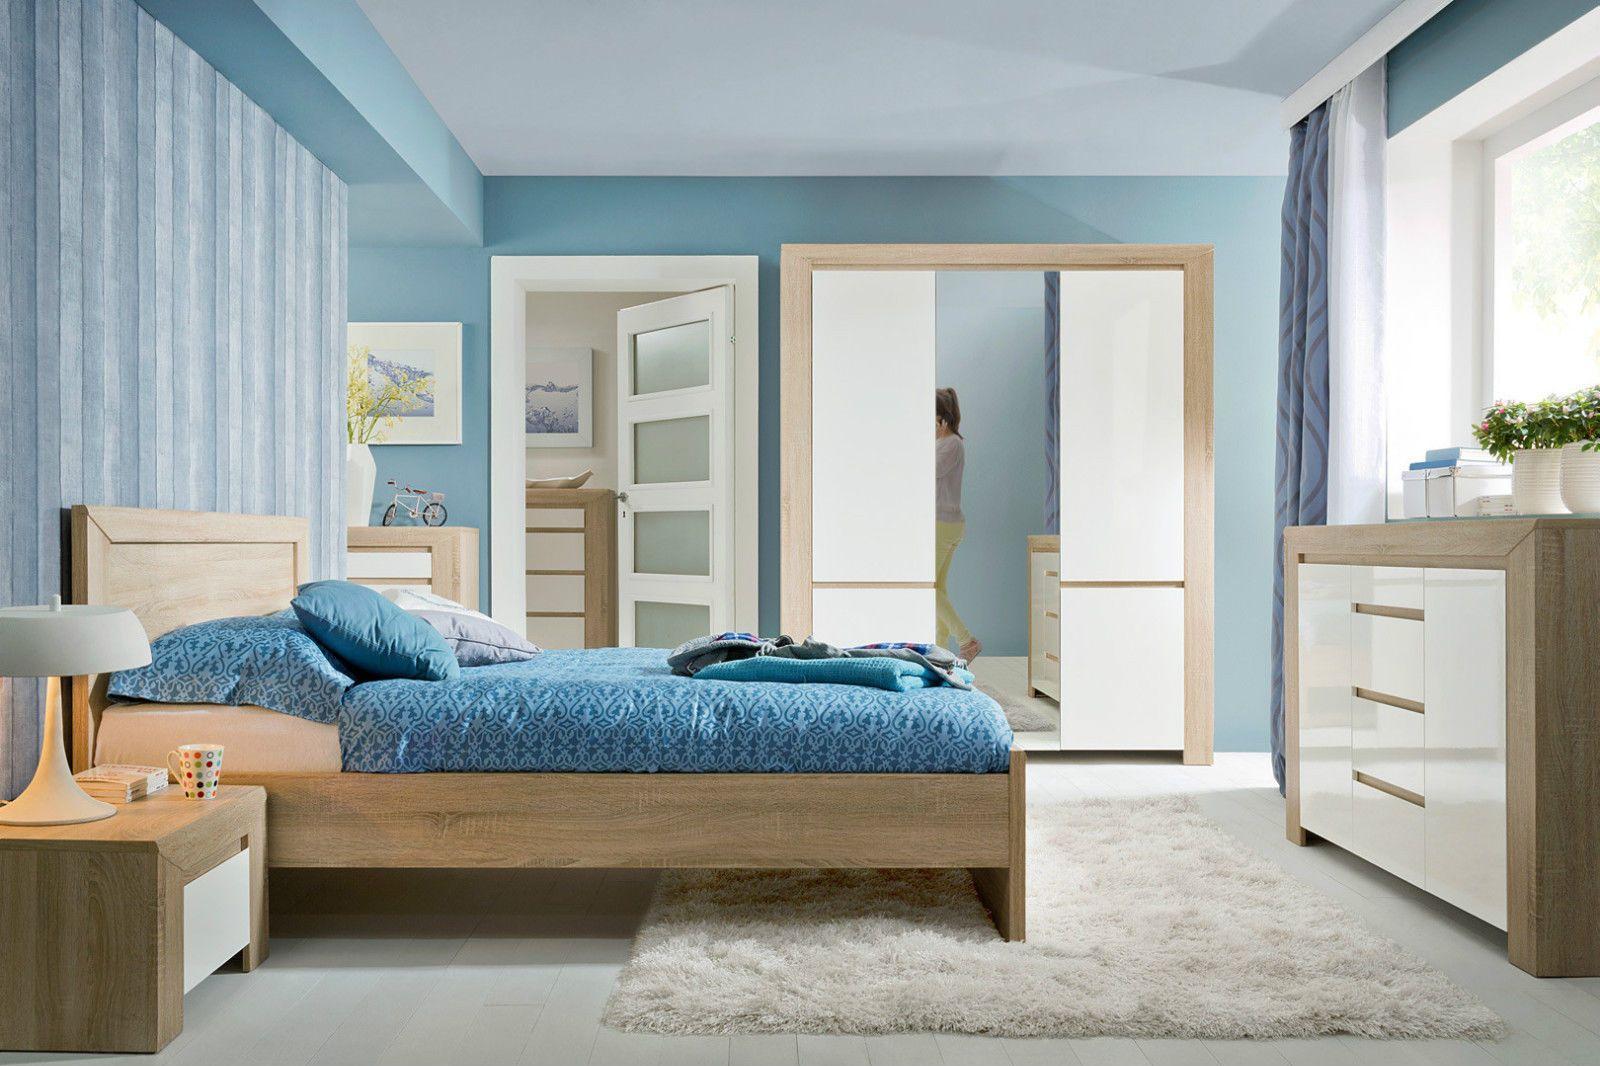 King Size Bedroom Furniture For Details About Danton New King Size Bed Bedroom Furniture Headboard